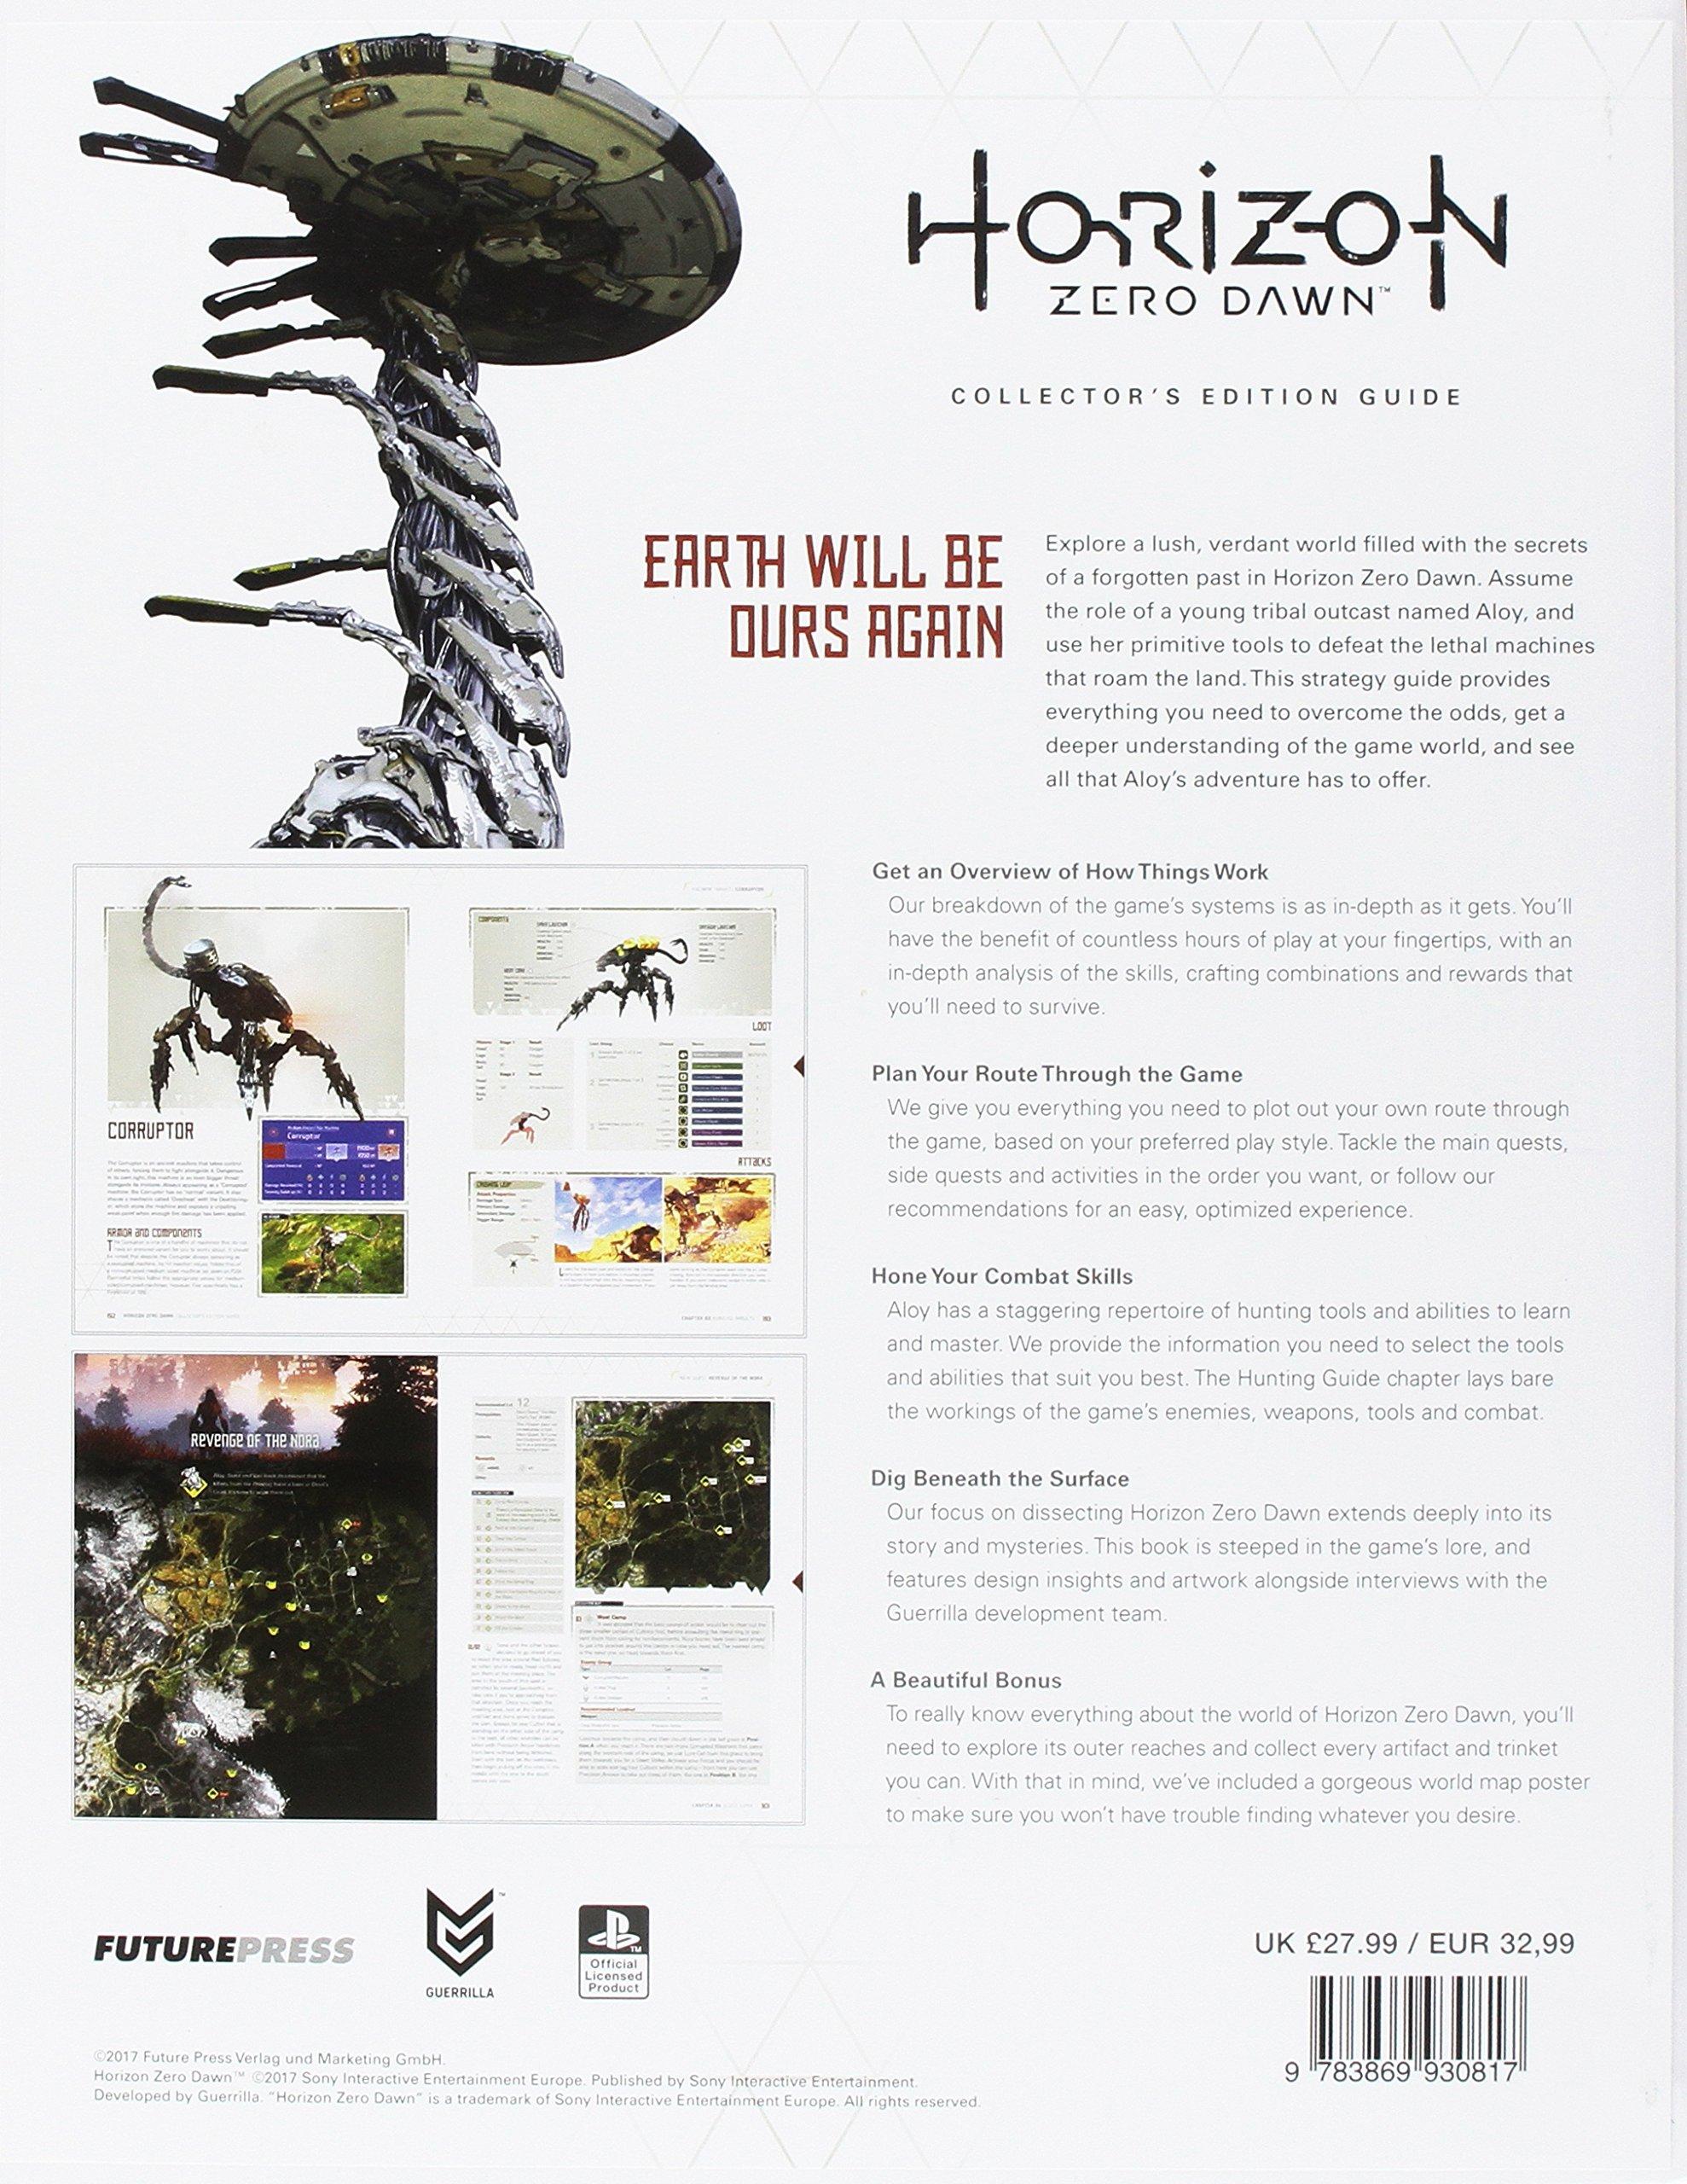 Horizon zero dawn collectors edition guide livros na amazon brasil horizon zero dawn collectors edition guide livros na amazon brasil 9783869930817 fandeluxe Image collections